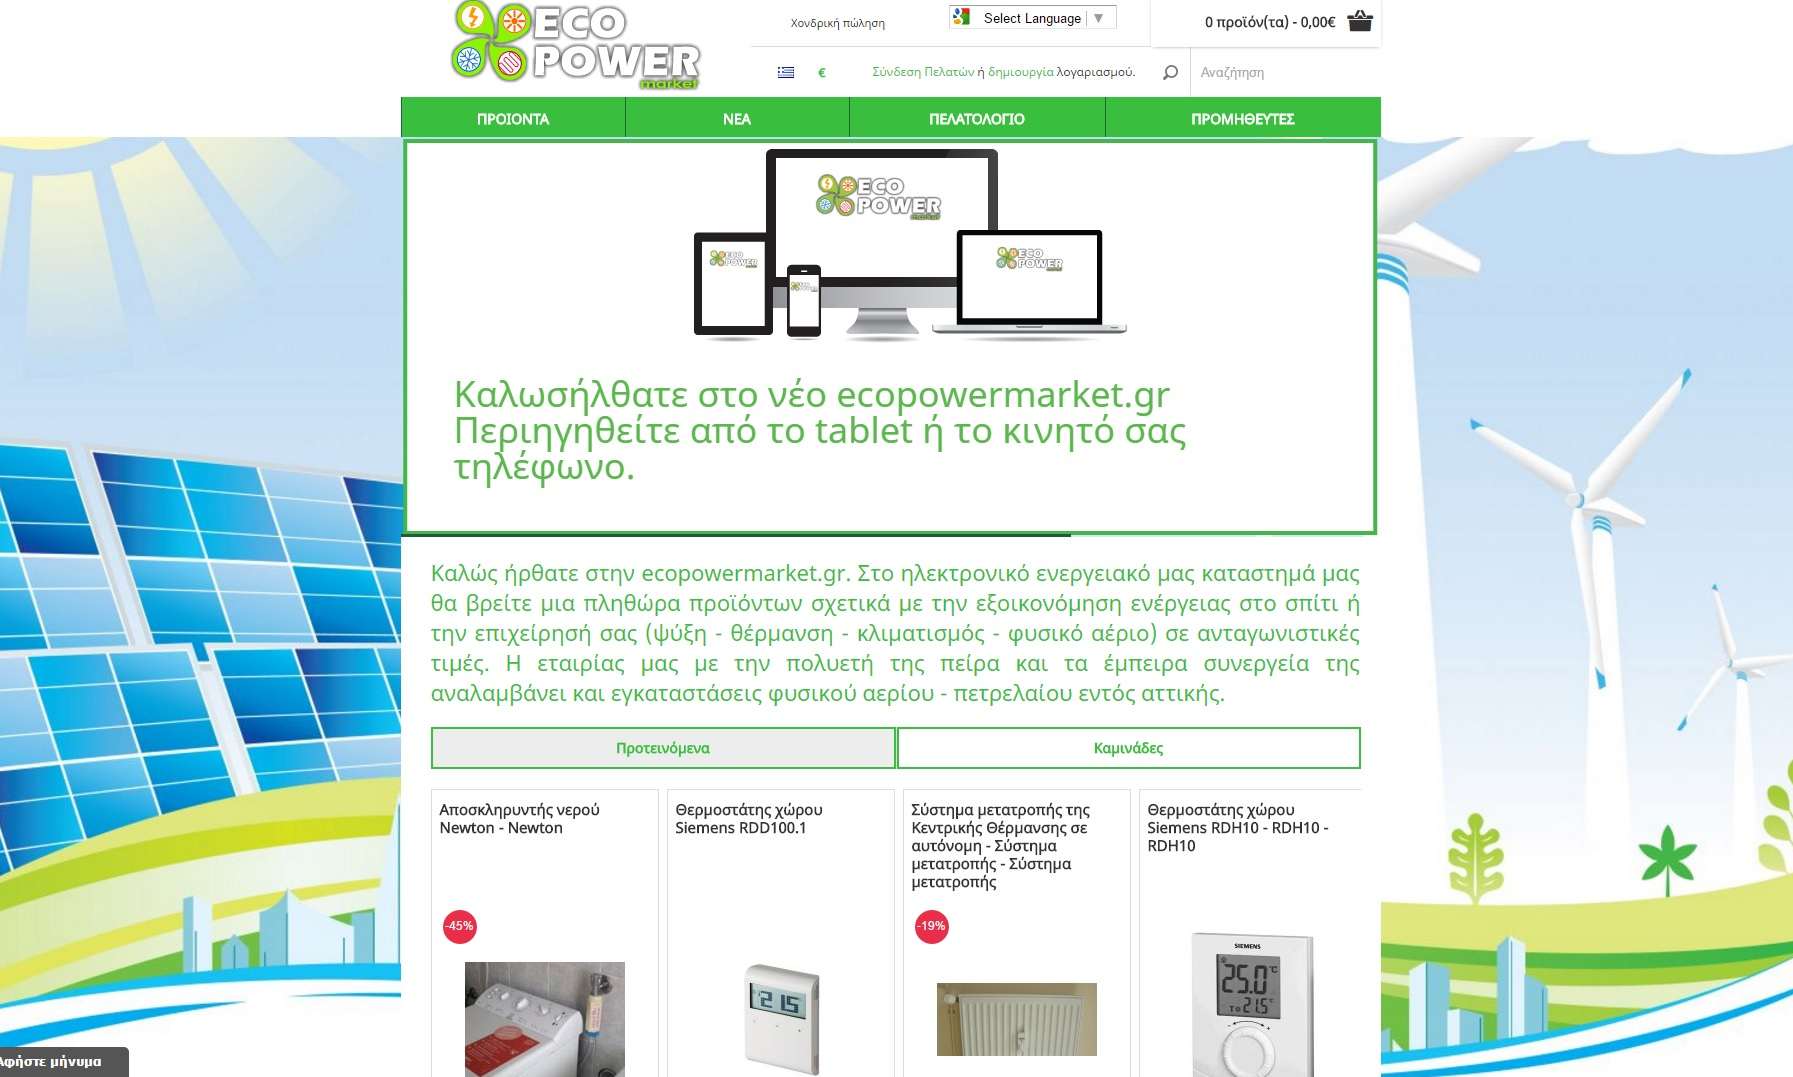 https://www.jupiweb.com/assets/uploads/files/thumbs/thumb_dc150-ecopowermarket.jpg